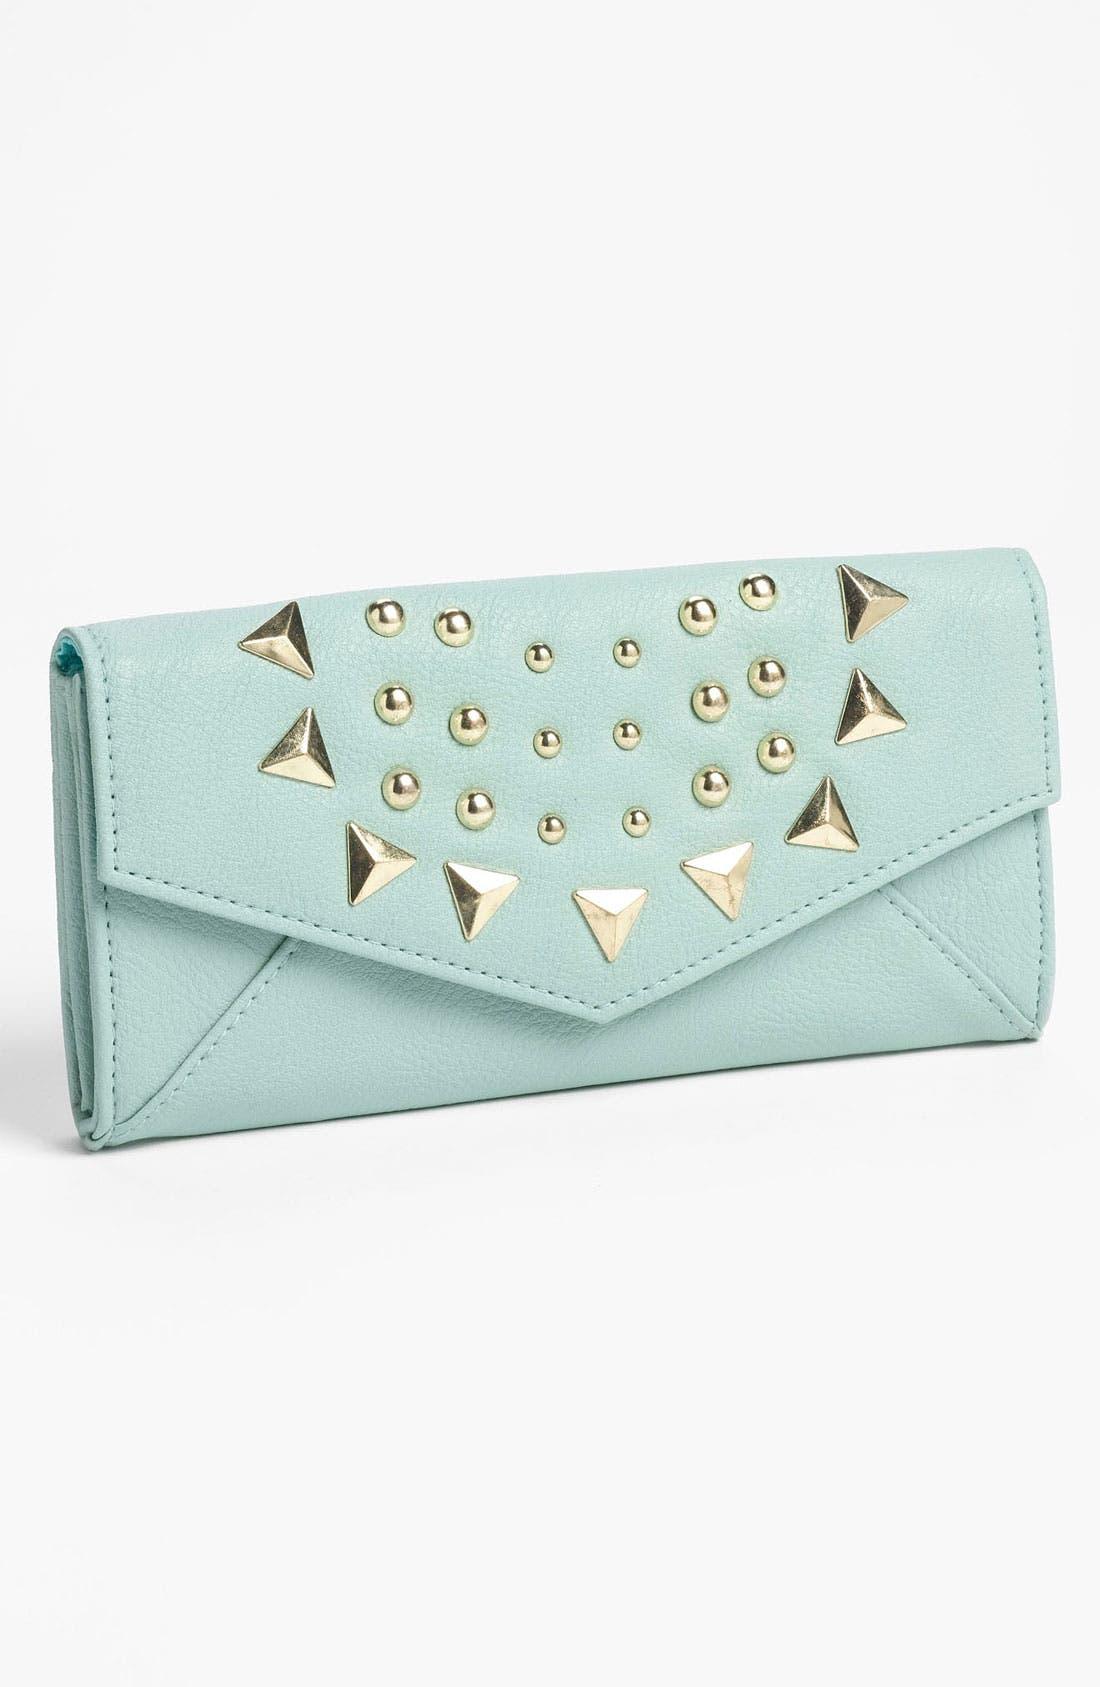 Main Image - Lulu Studded Envelope Wallet